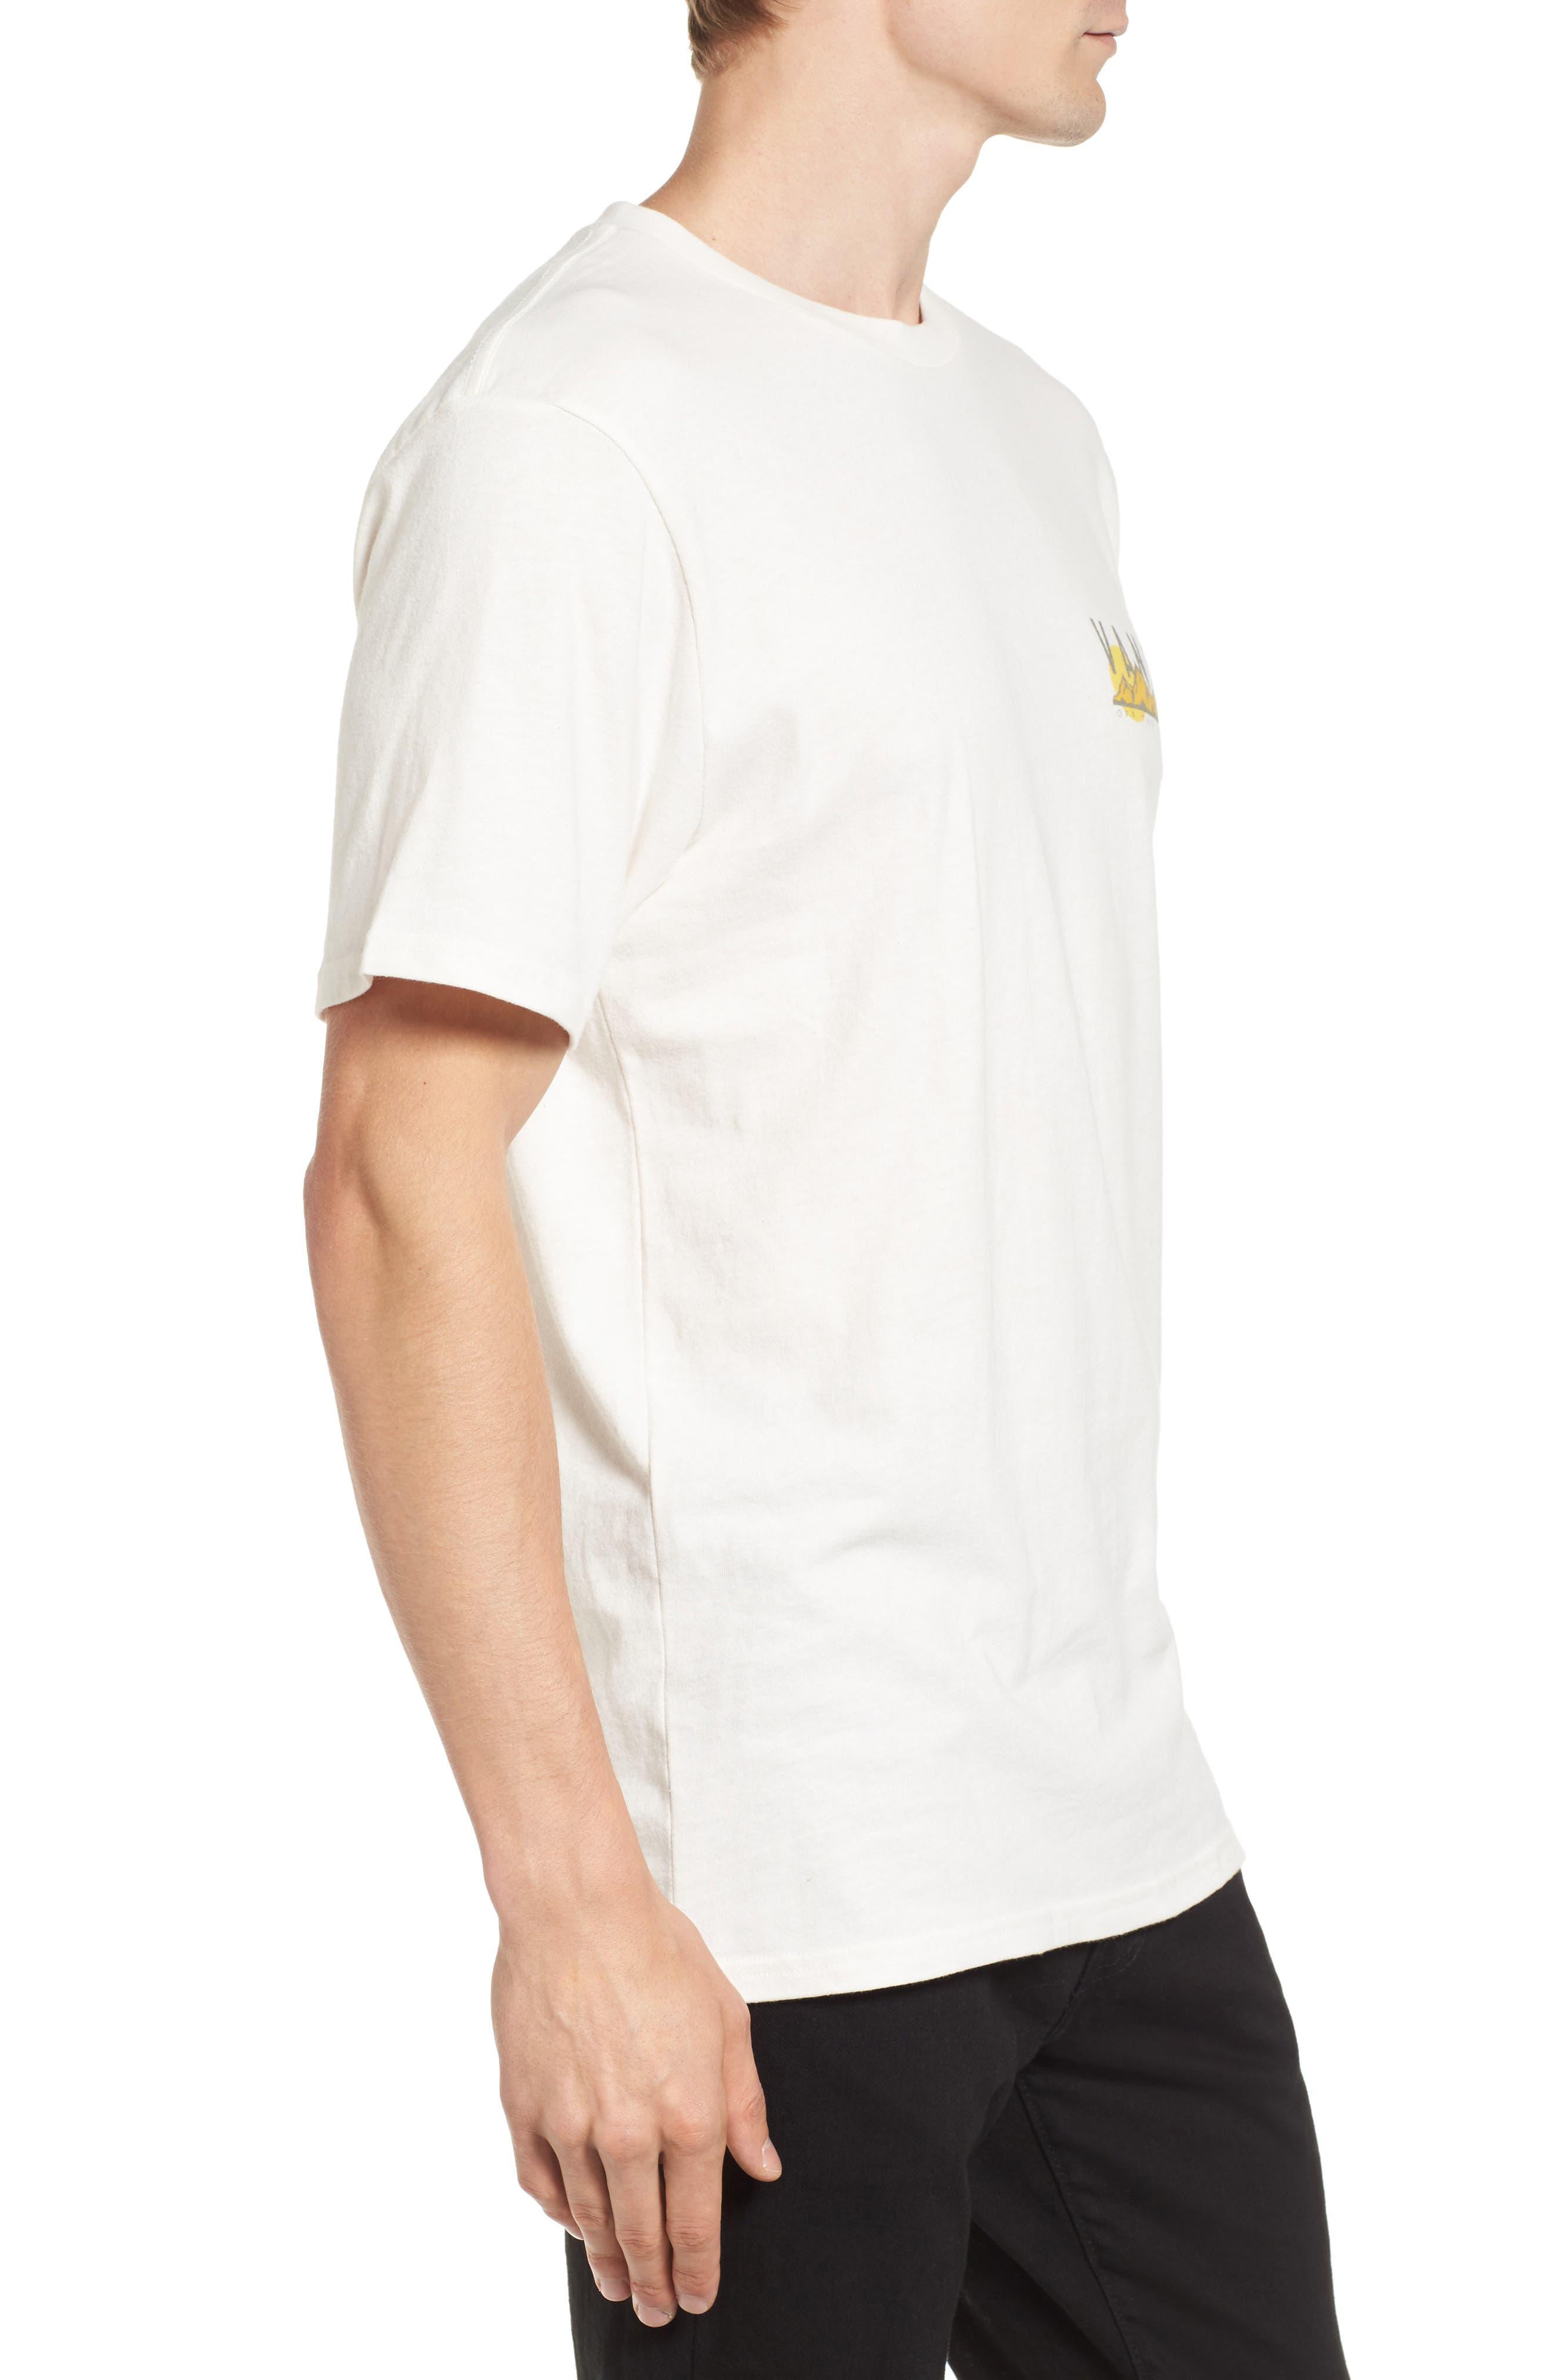 Mountain T-Shirt,                             Alternate thumbnail 3, color,                             100